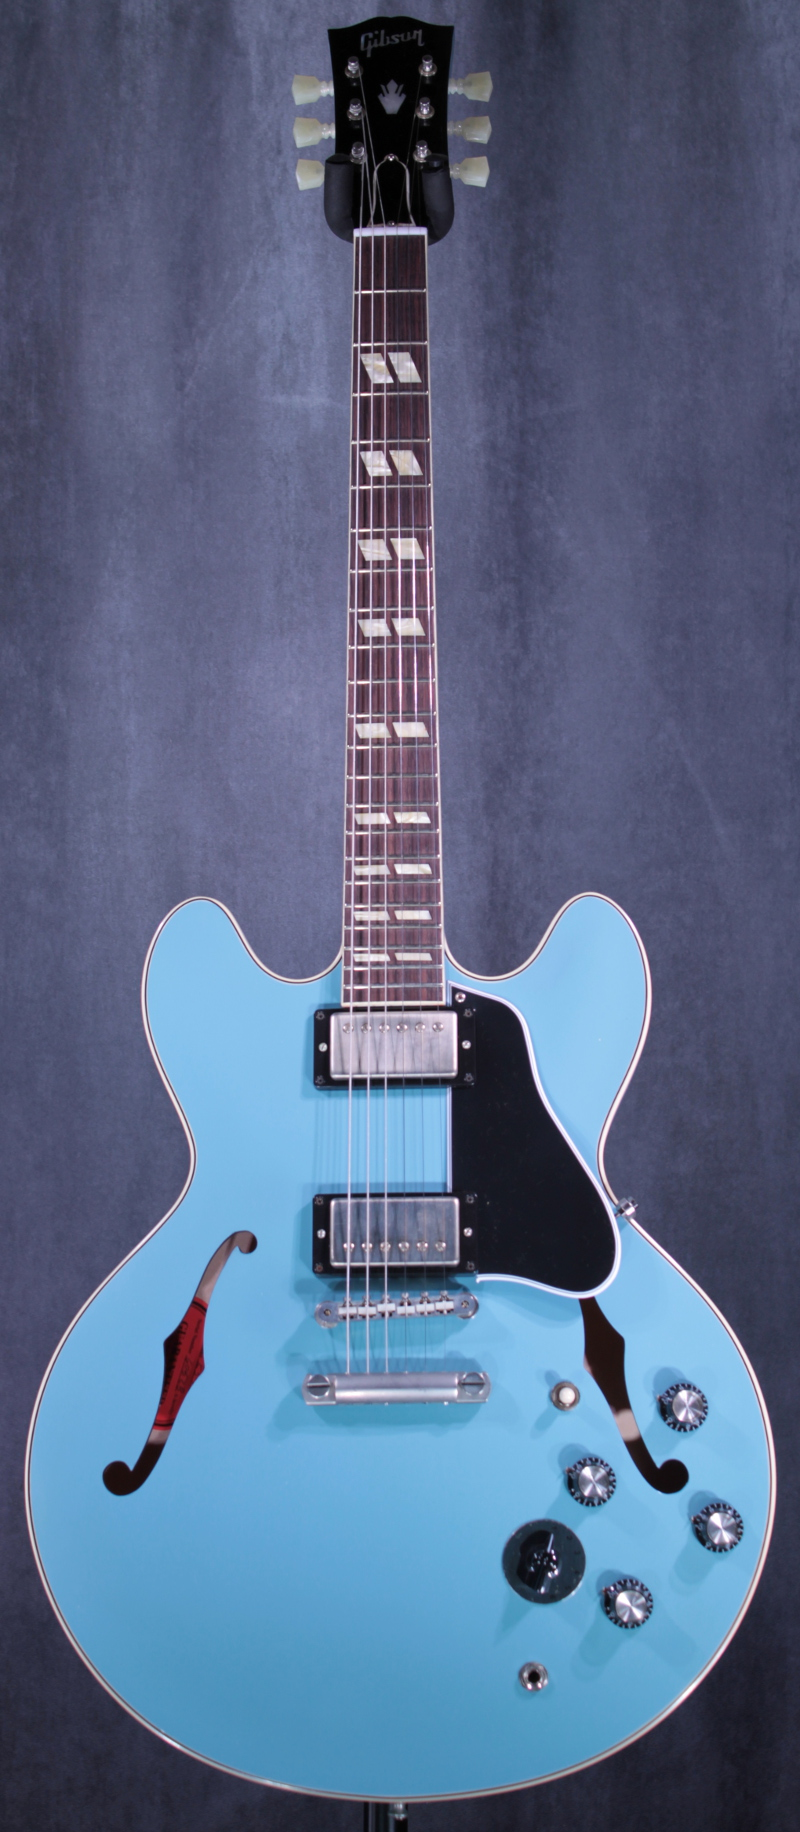 2016 '64 ES-345 VOS Frost Blue Ltd